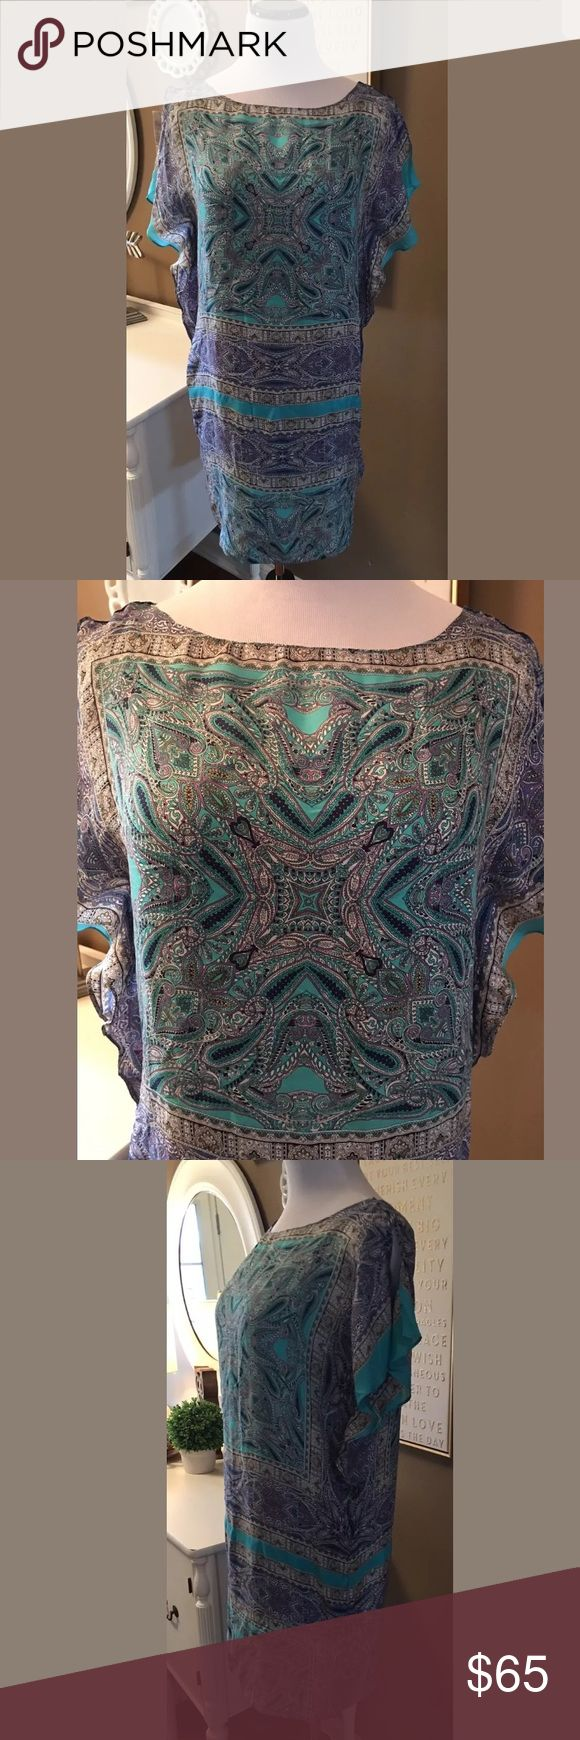 Massimo Dutti Silk Scarf Dress w/ Turquoise Liner Massimo Dutti 100% Silk Scarf Dress 6 Multi Colored With Turquoise Liner $145 Massimo Dutti Dresses